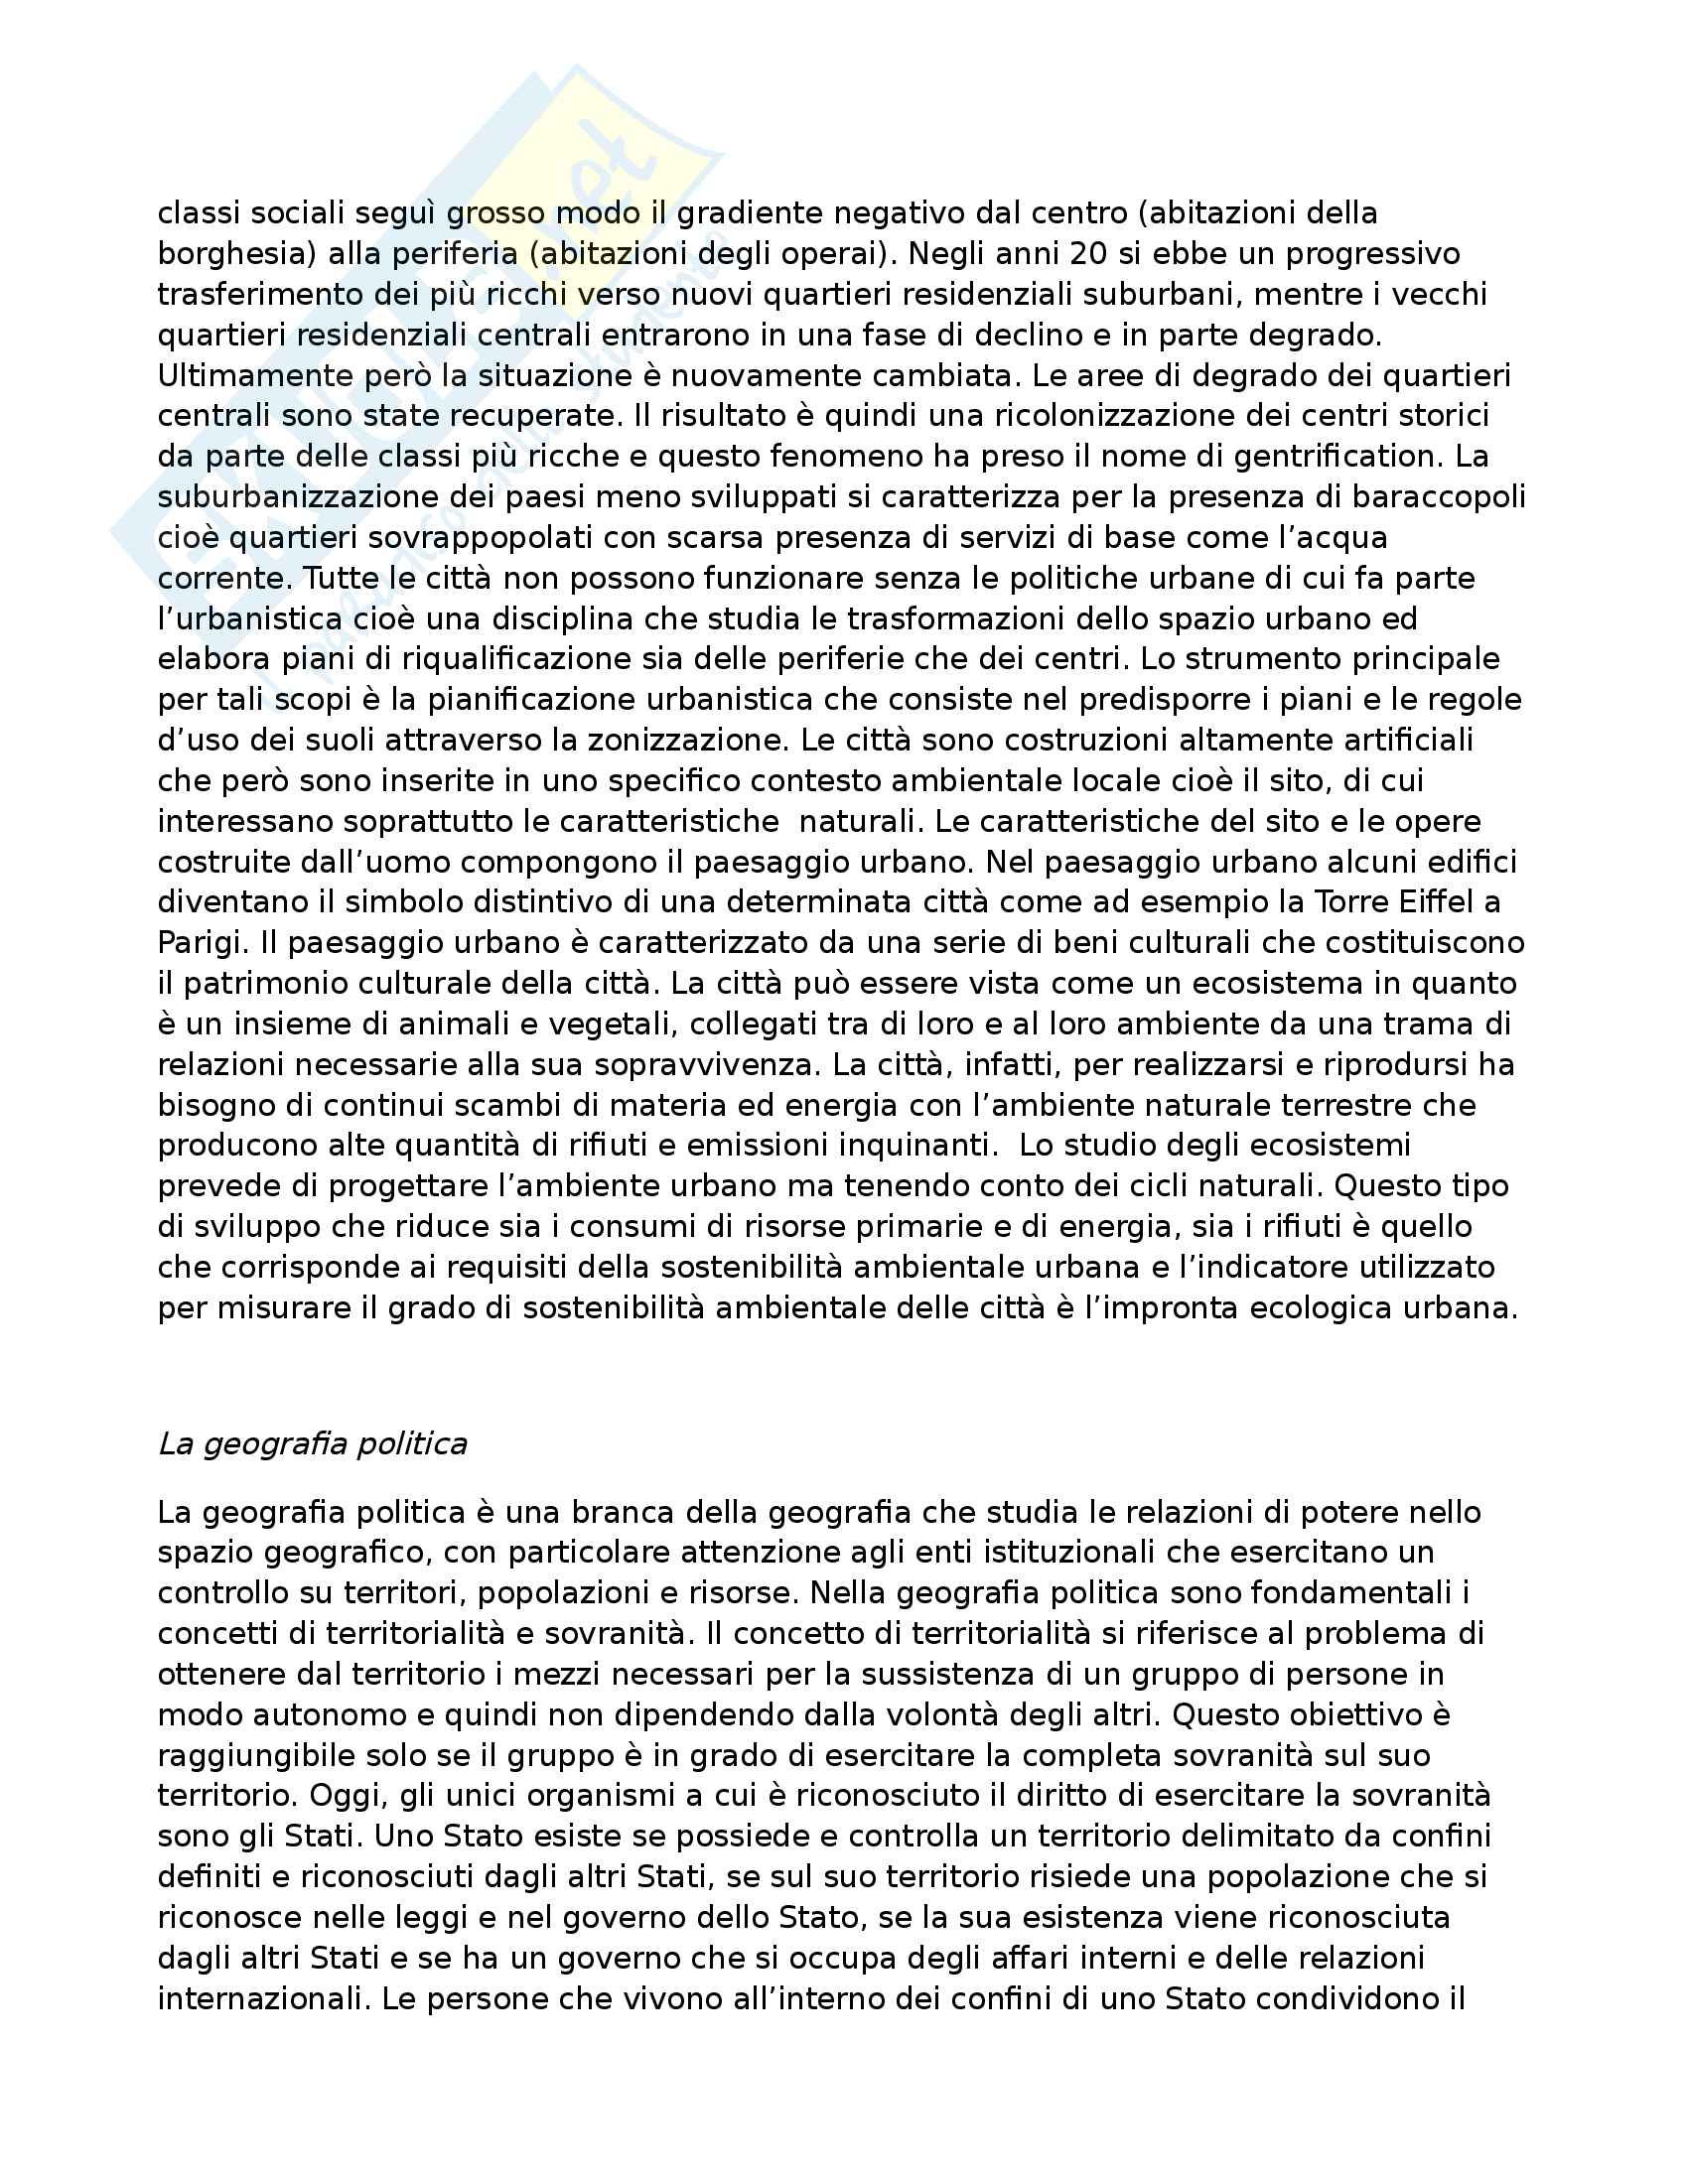 Riassunto esame Geografia umana, prof. Guadagno, libro consigliato 'Geografia umana,Un approccio visuale', Greiner, Dematteis,Lanza Pag. 21